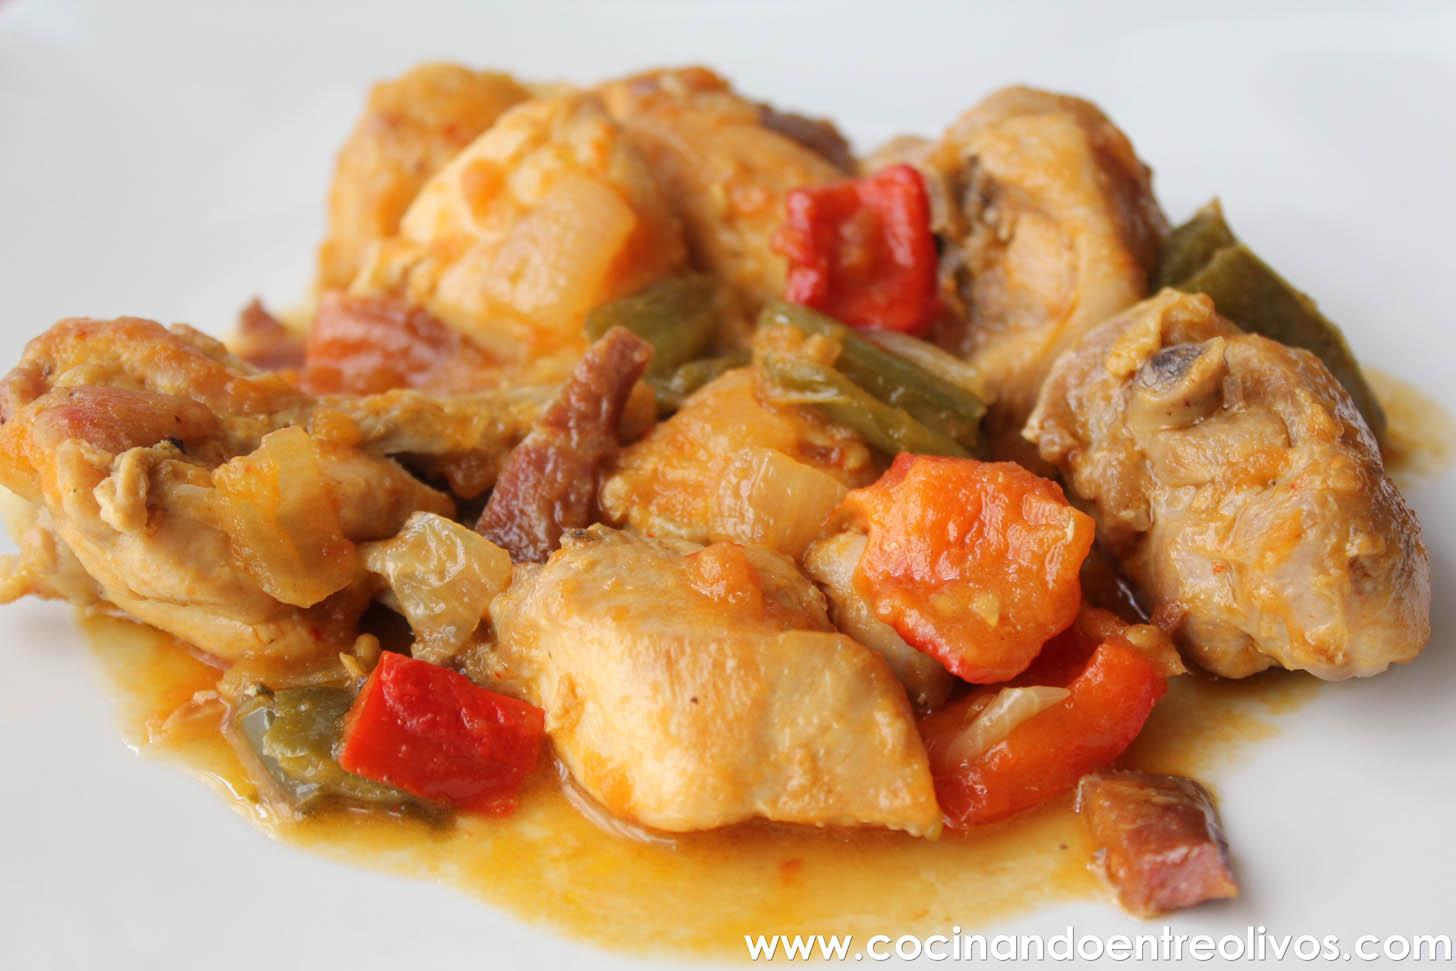 Pollo al chilindr n receta paso a paso cocinando entre for Maneras de cocinar pollo